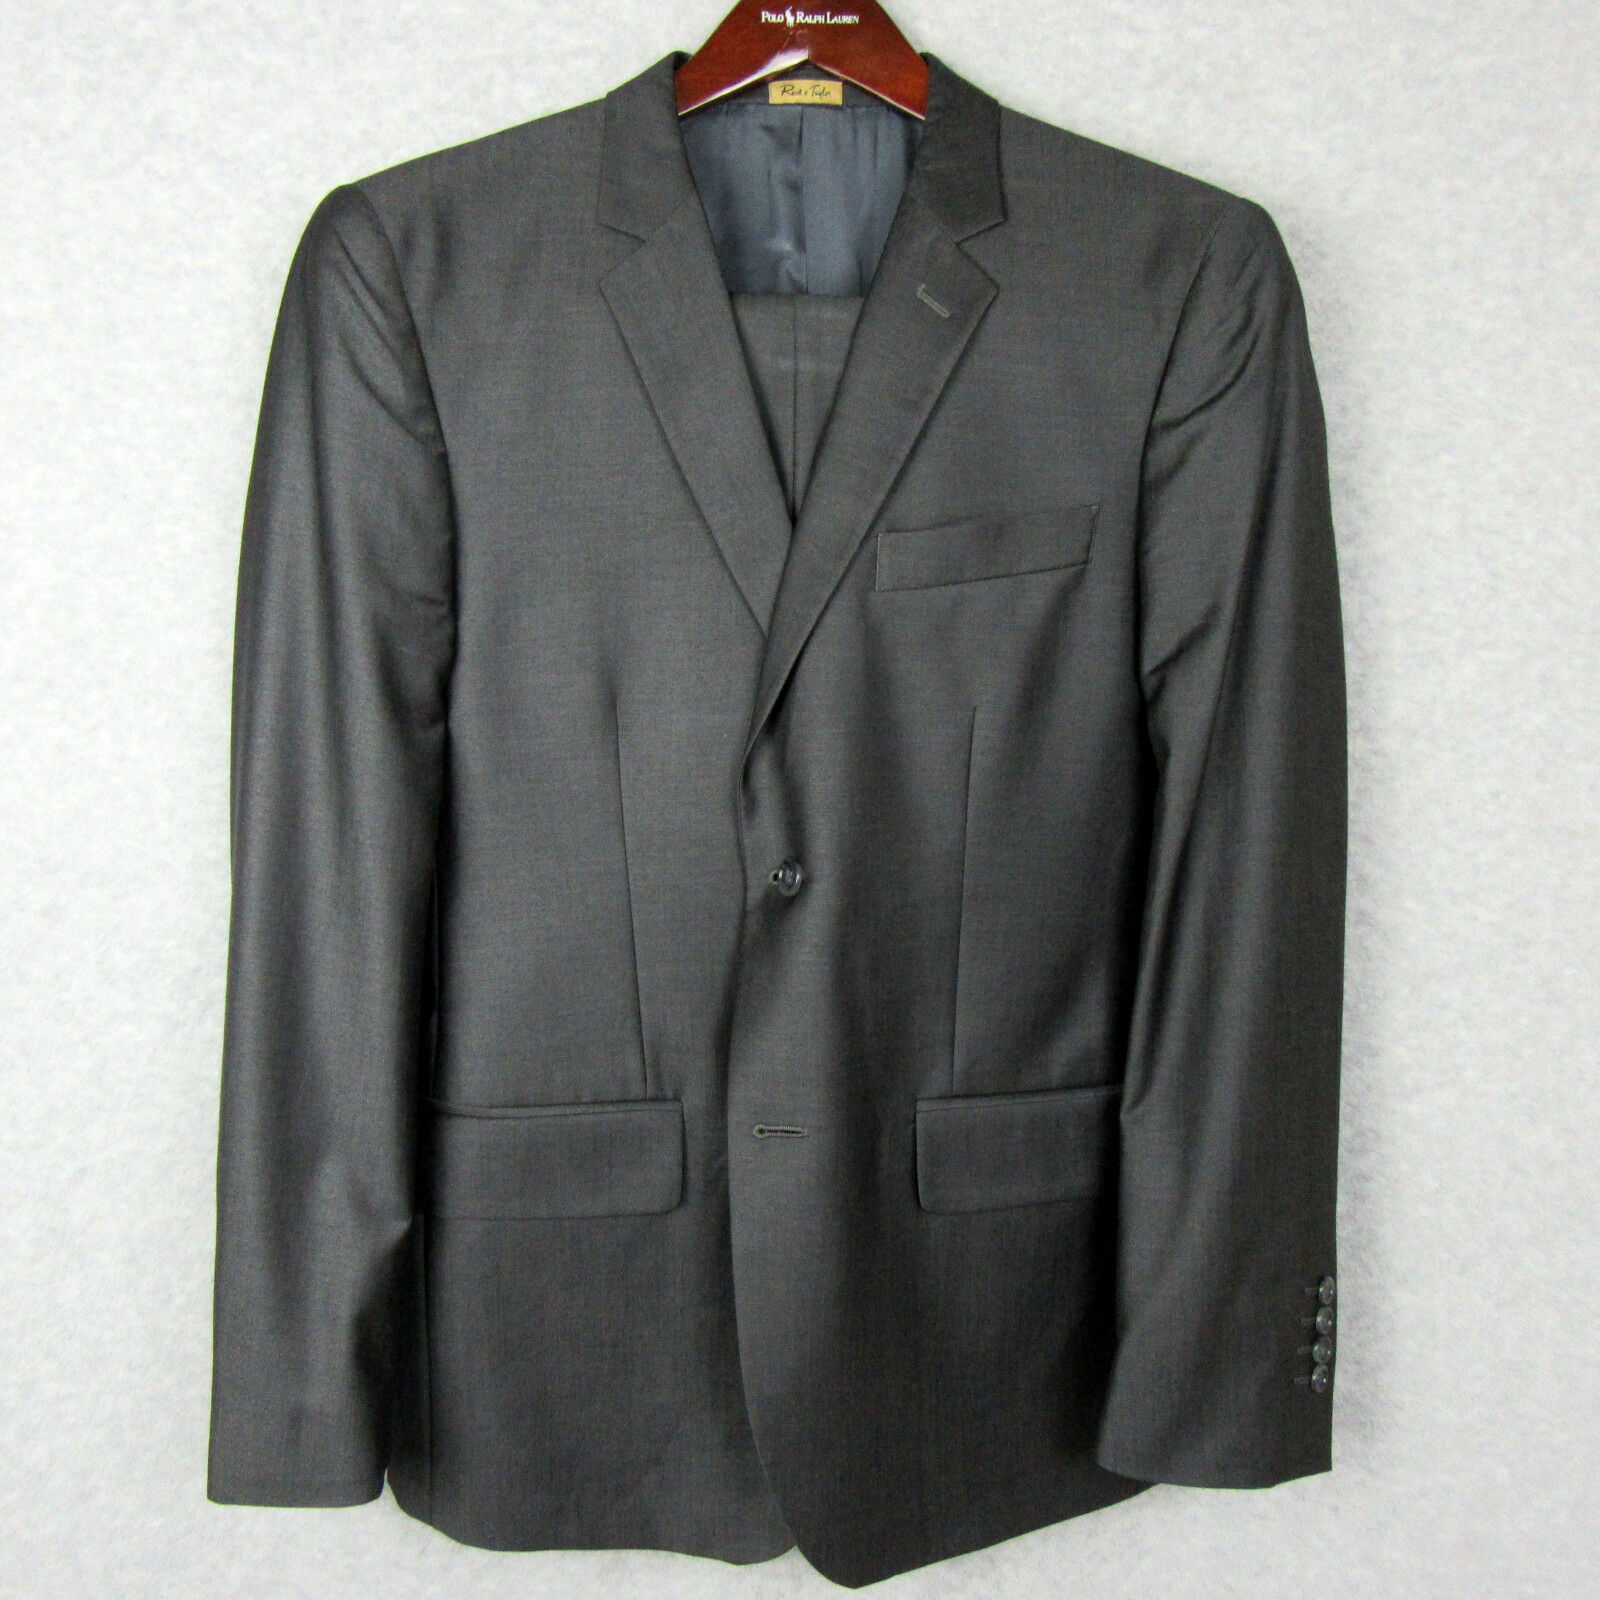 Reid & Taylor  Herren Bespoke Custom Wool Blend Suit Größe 40R Pants Blazer